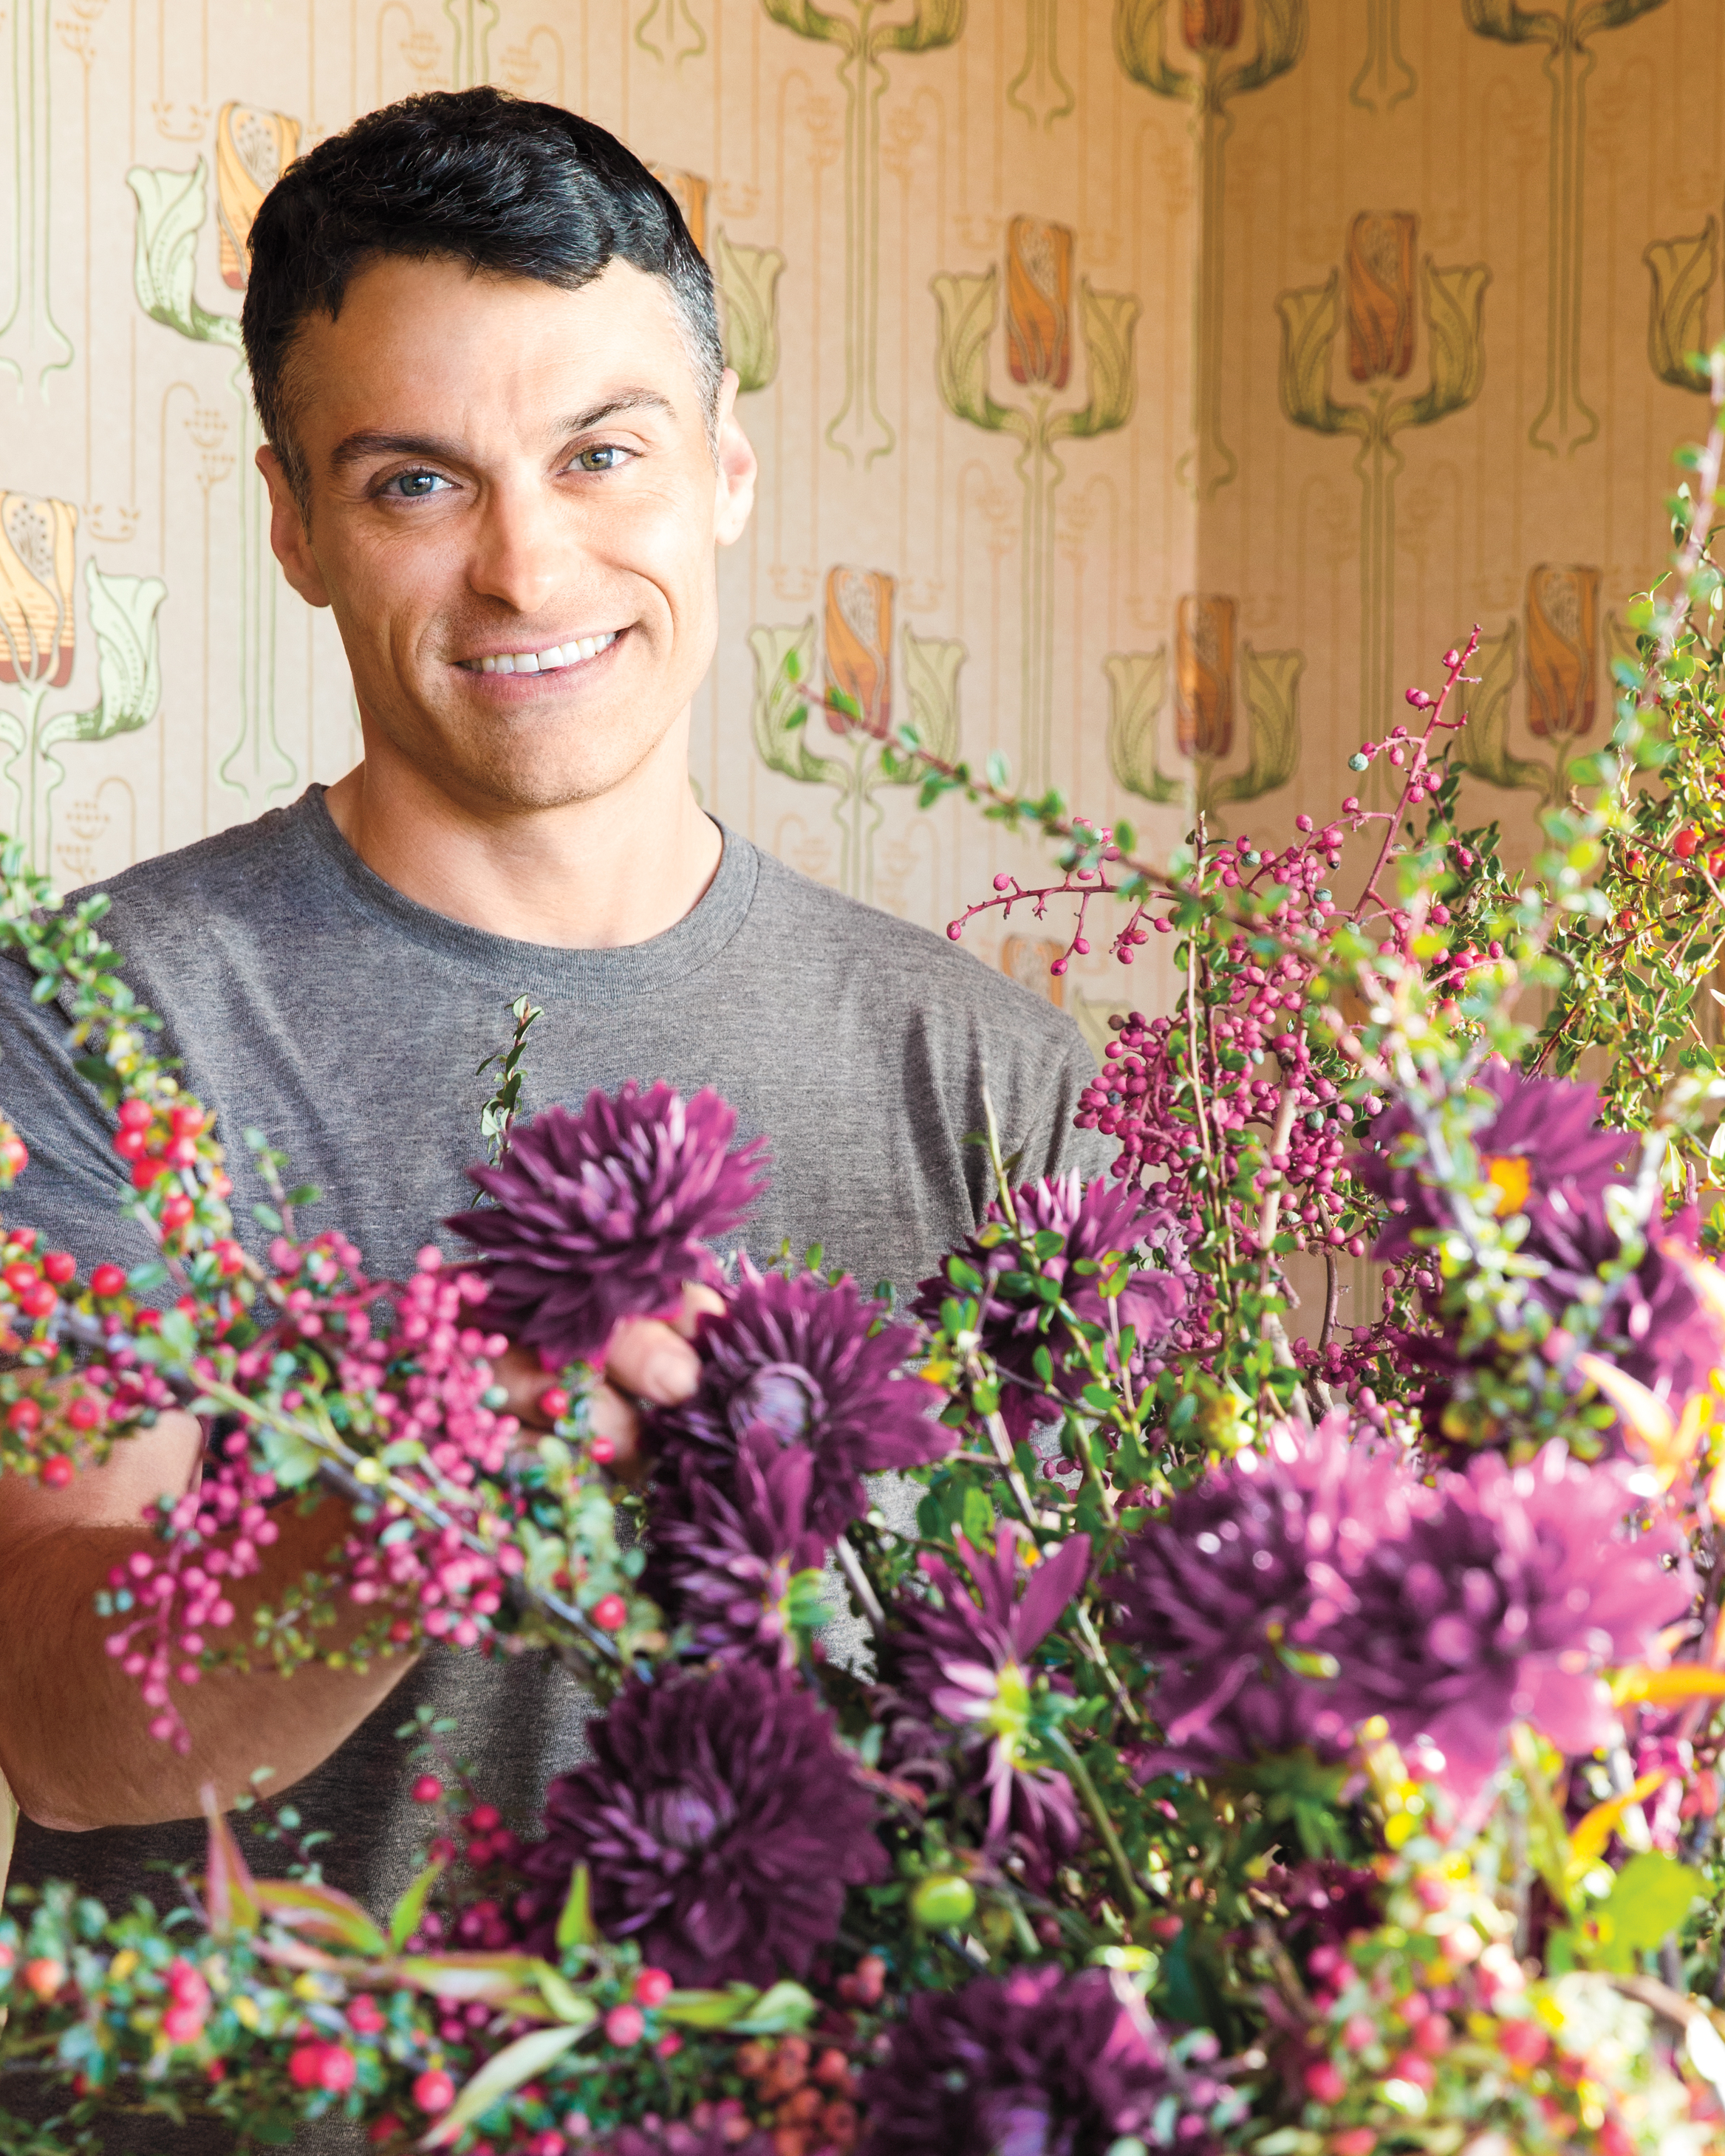 flowers-max-portrait-6186-mwd110838.jpg